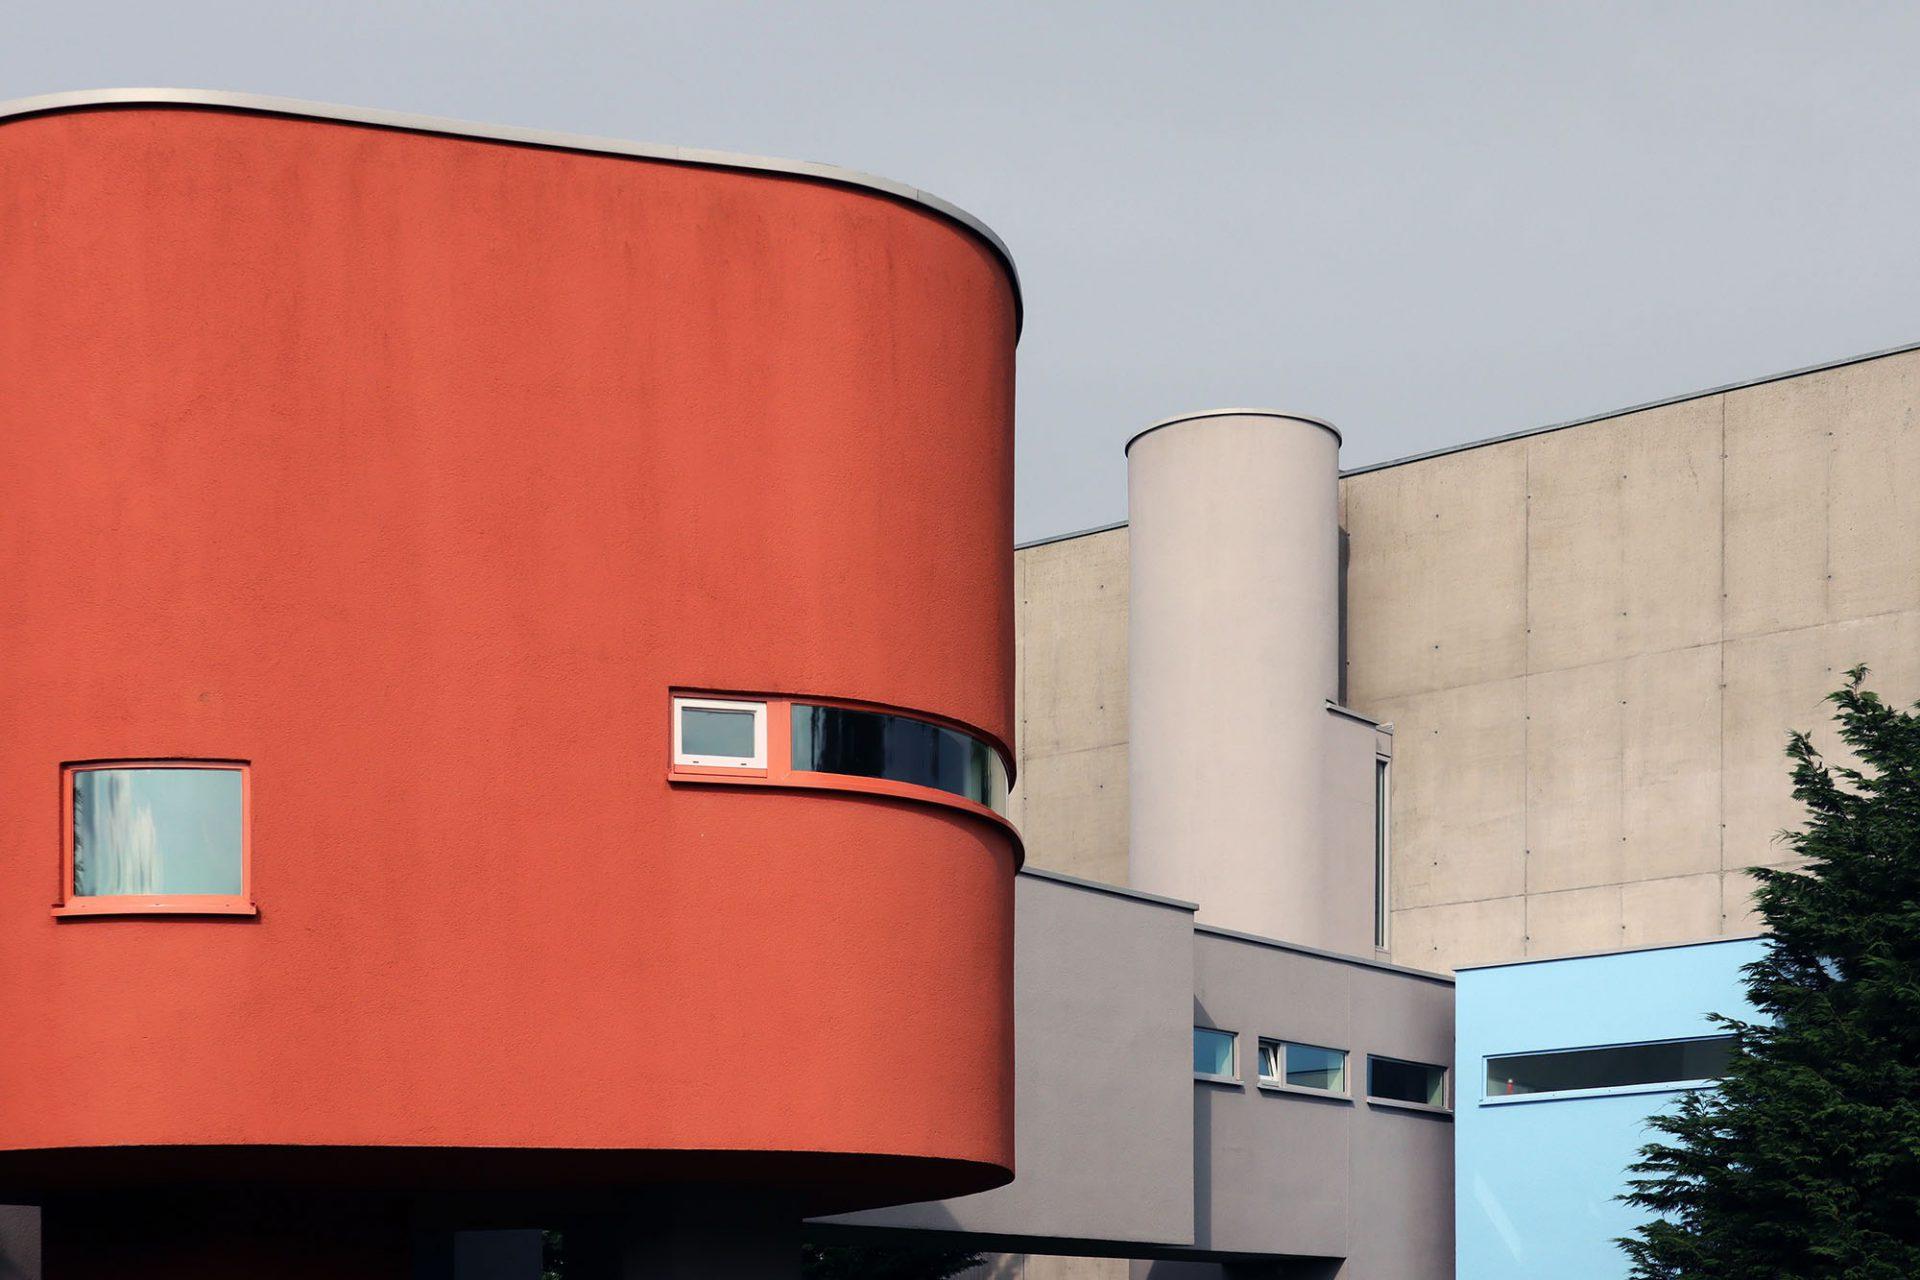 Wall House #2 von John Hejduk